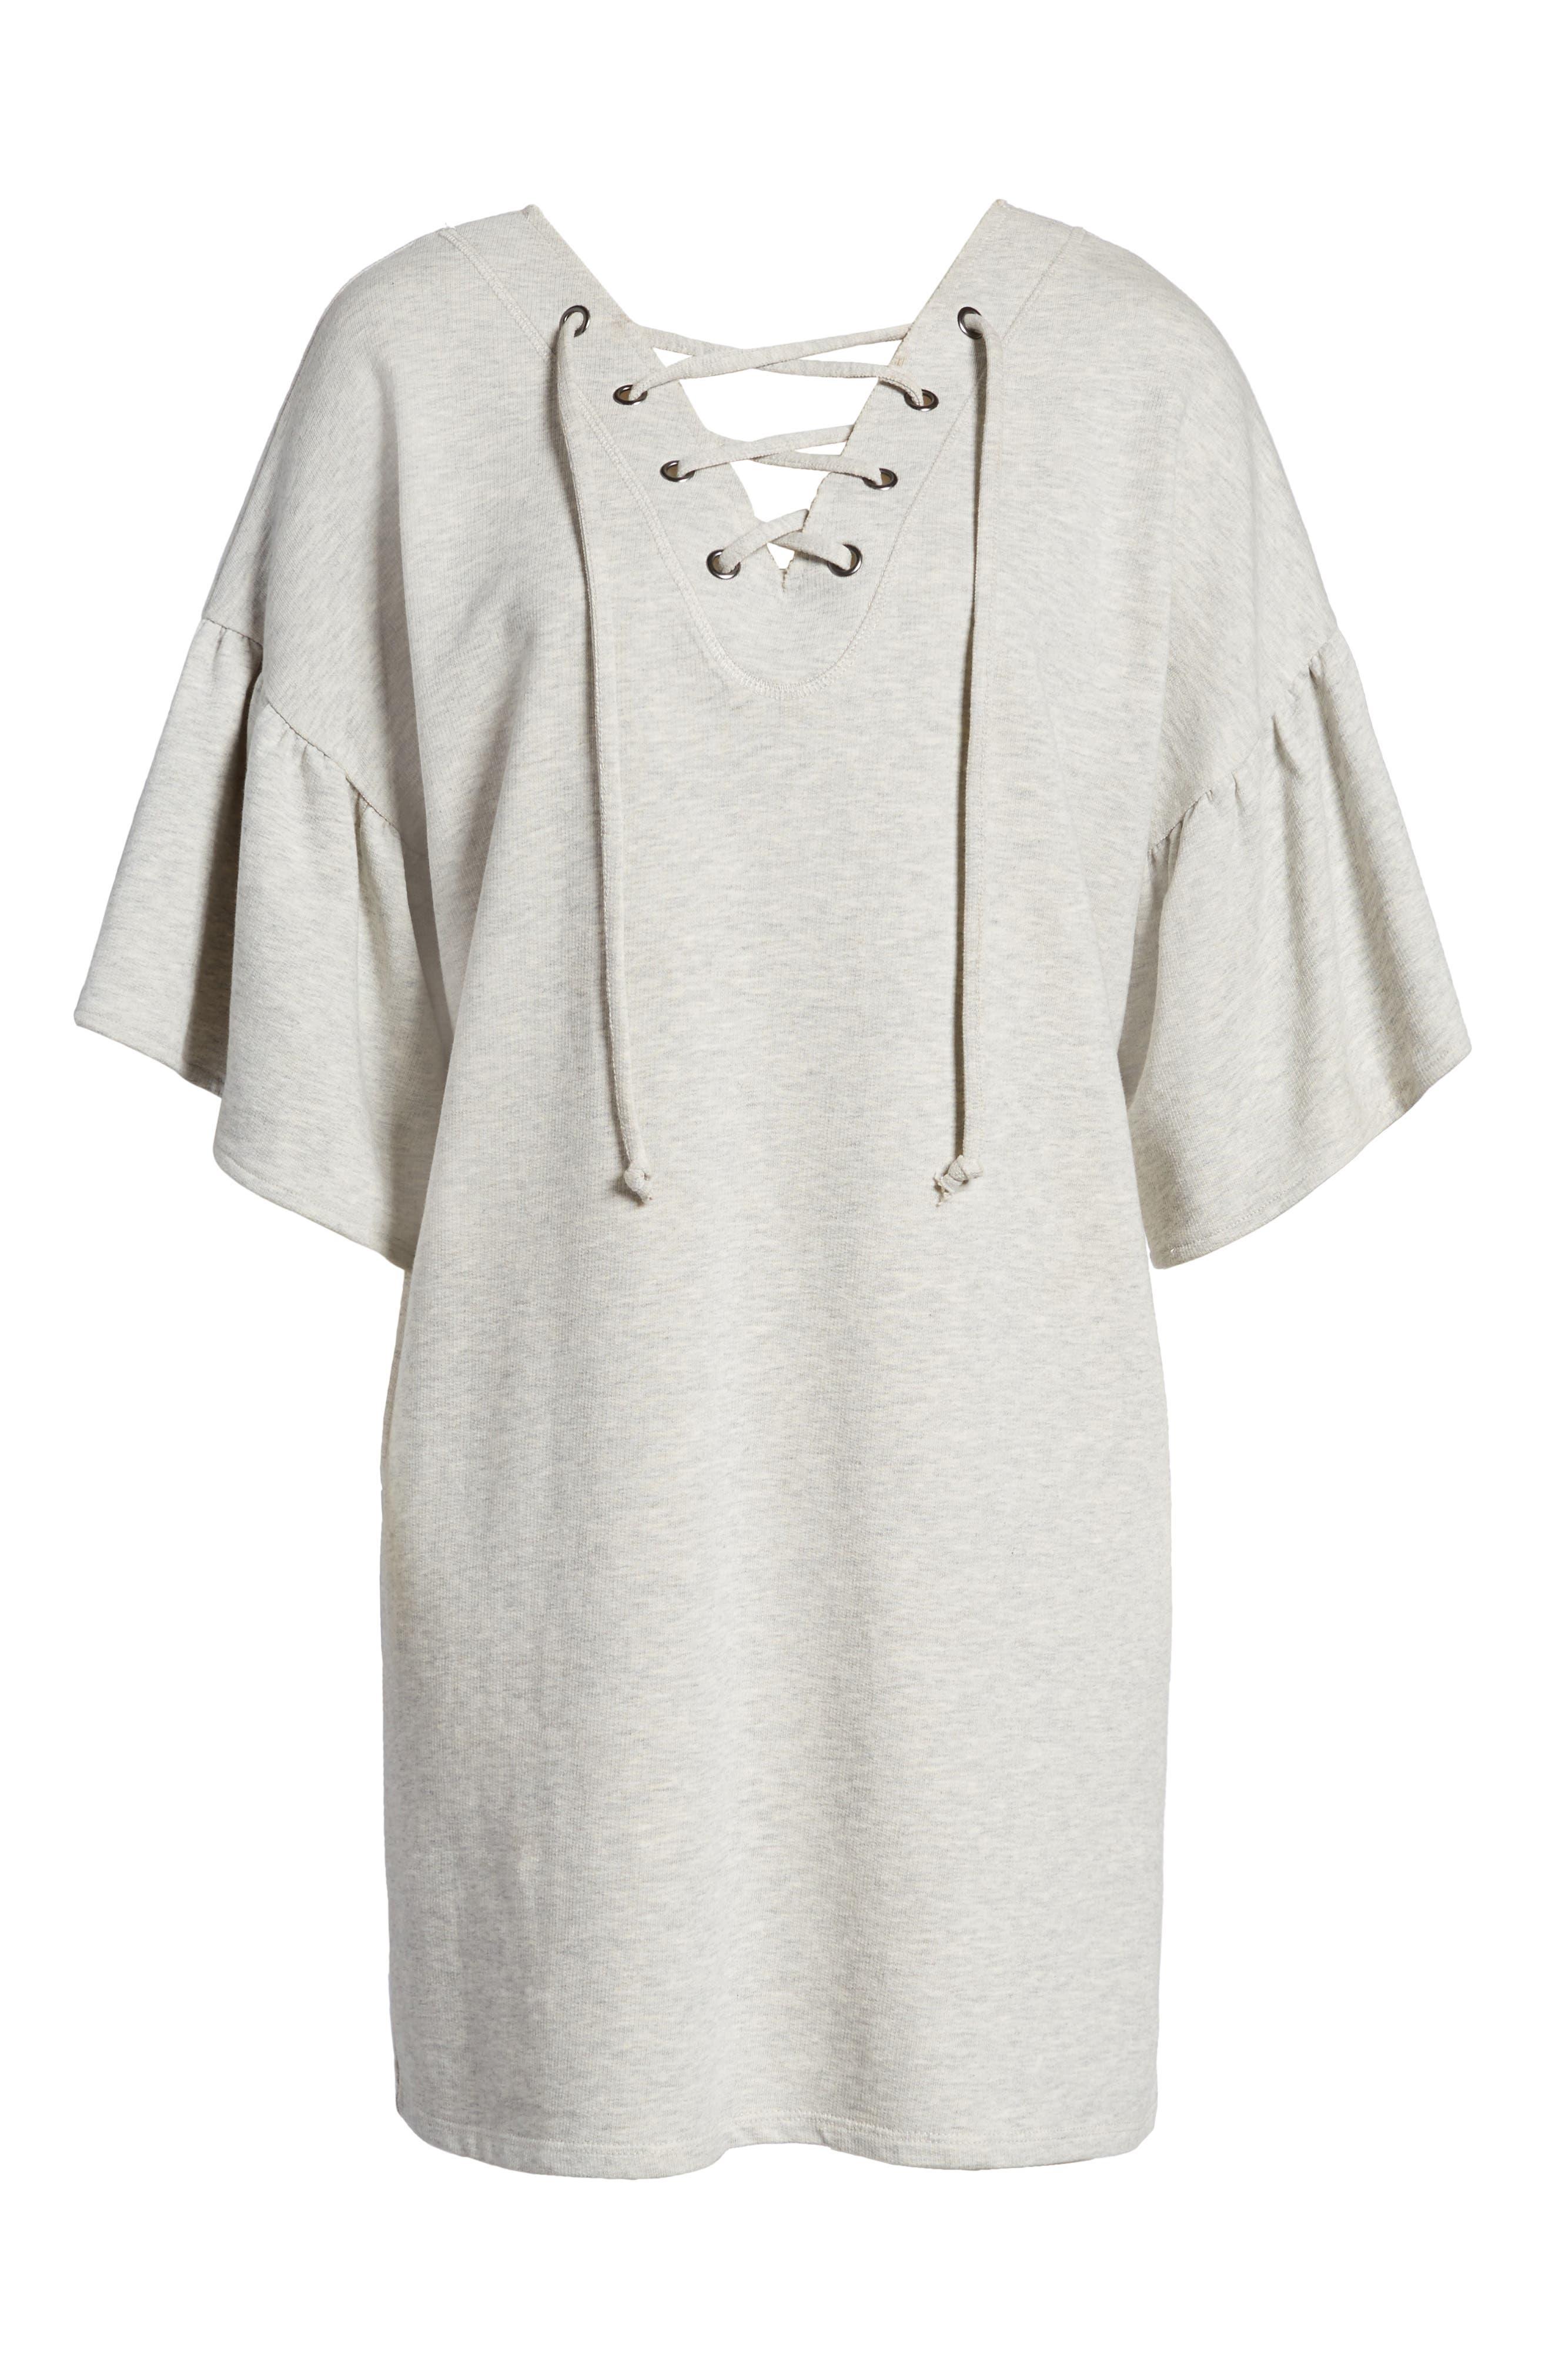 Mariska Fleece Knit Dress,                             Alternate thumbnail 7, color,                             Heather Sterling